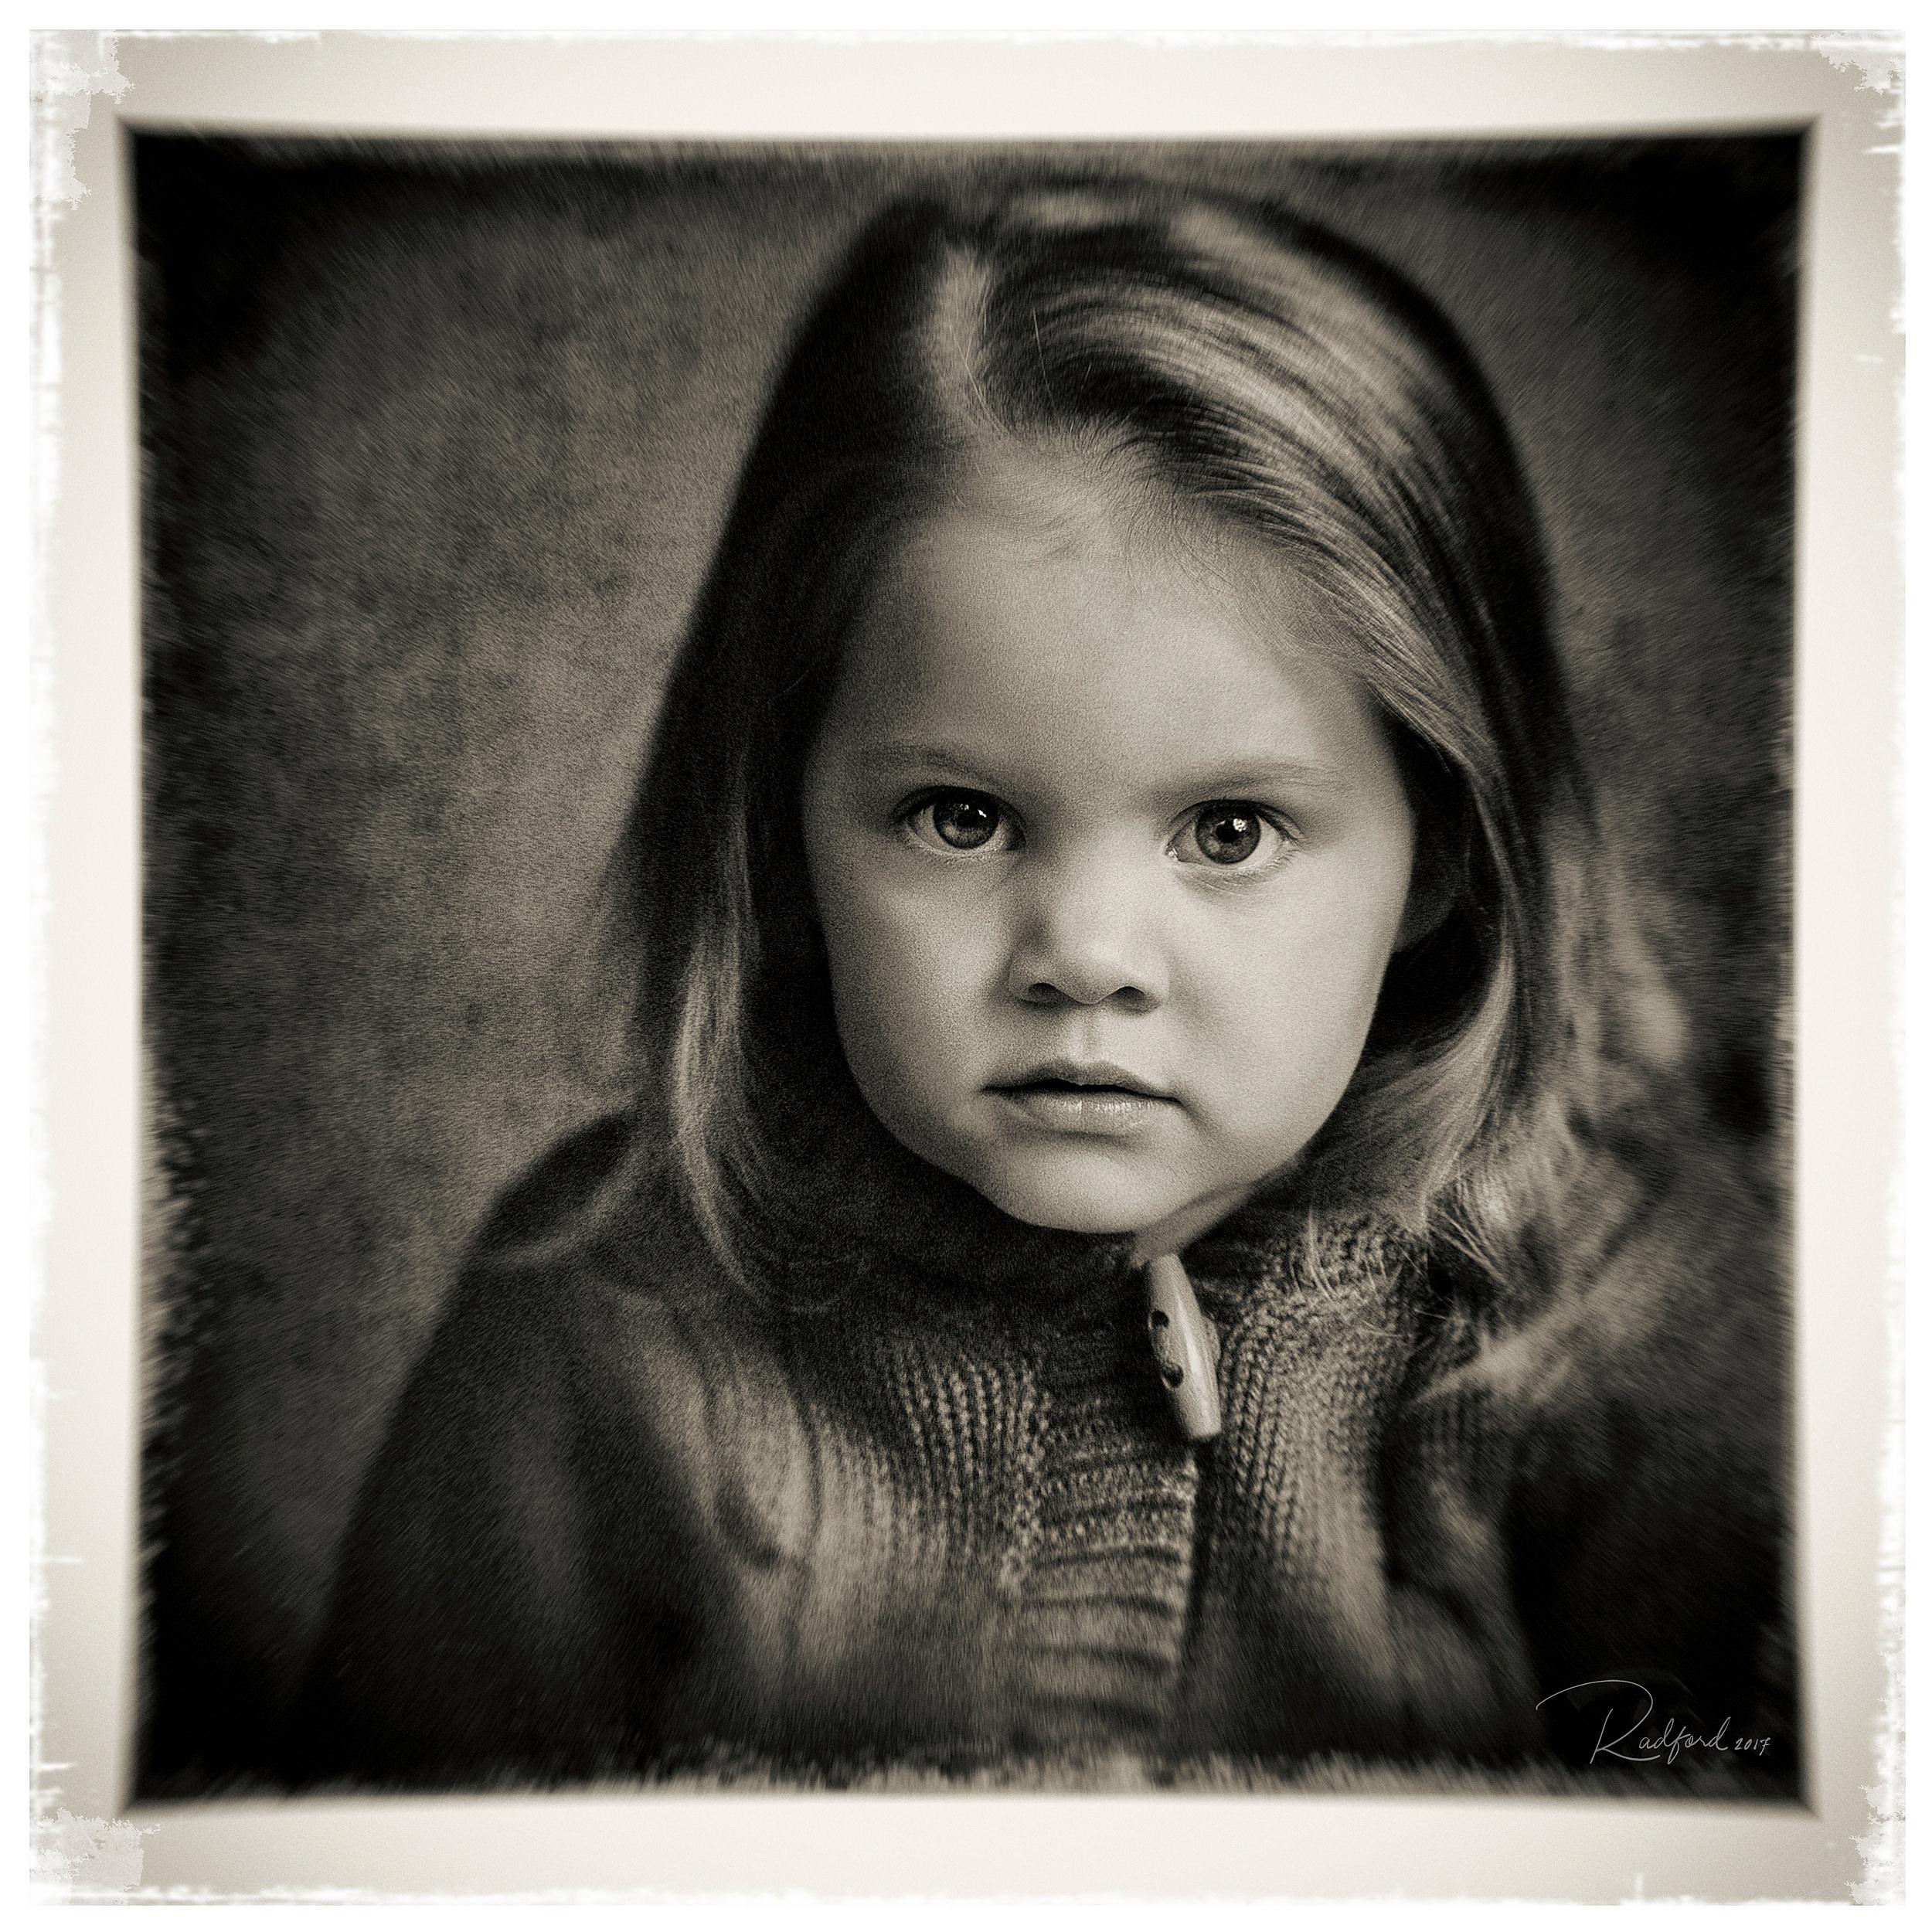 Gallery-soulful portraits-girl-studio portraits.jpg